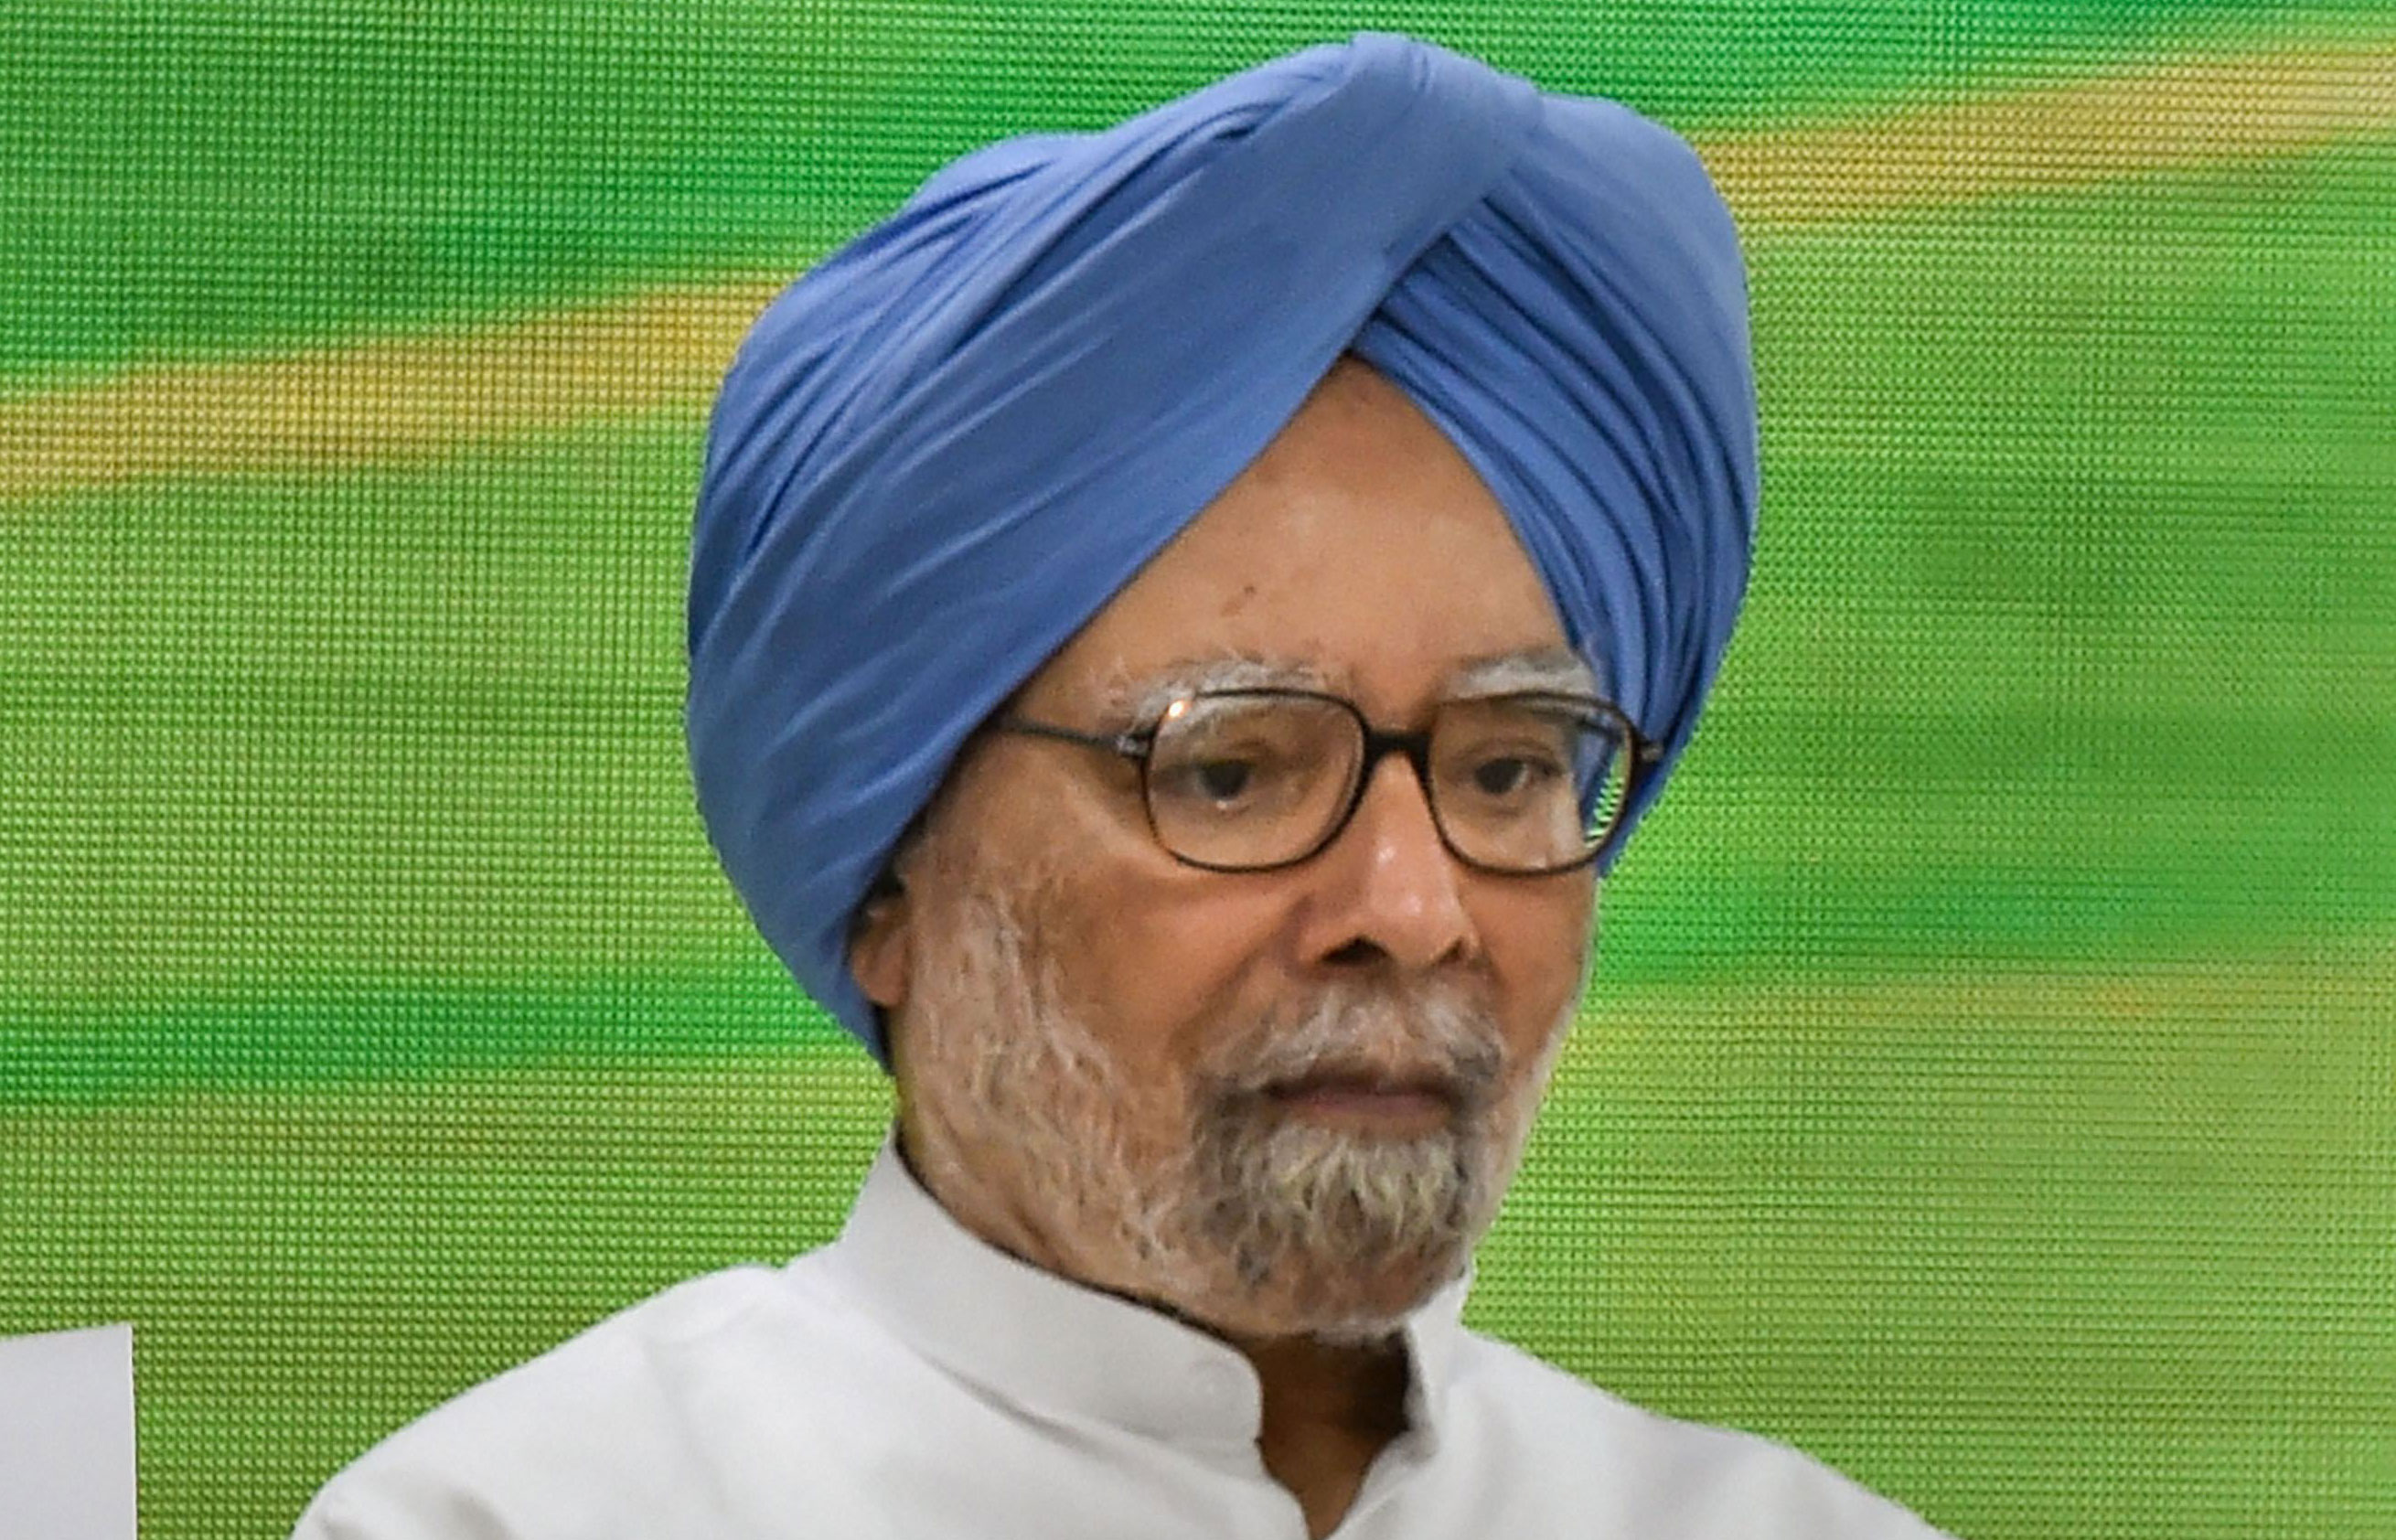 Wake up, slowdown is dangerous: Manmohan Singh